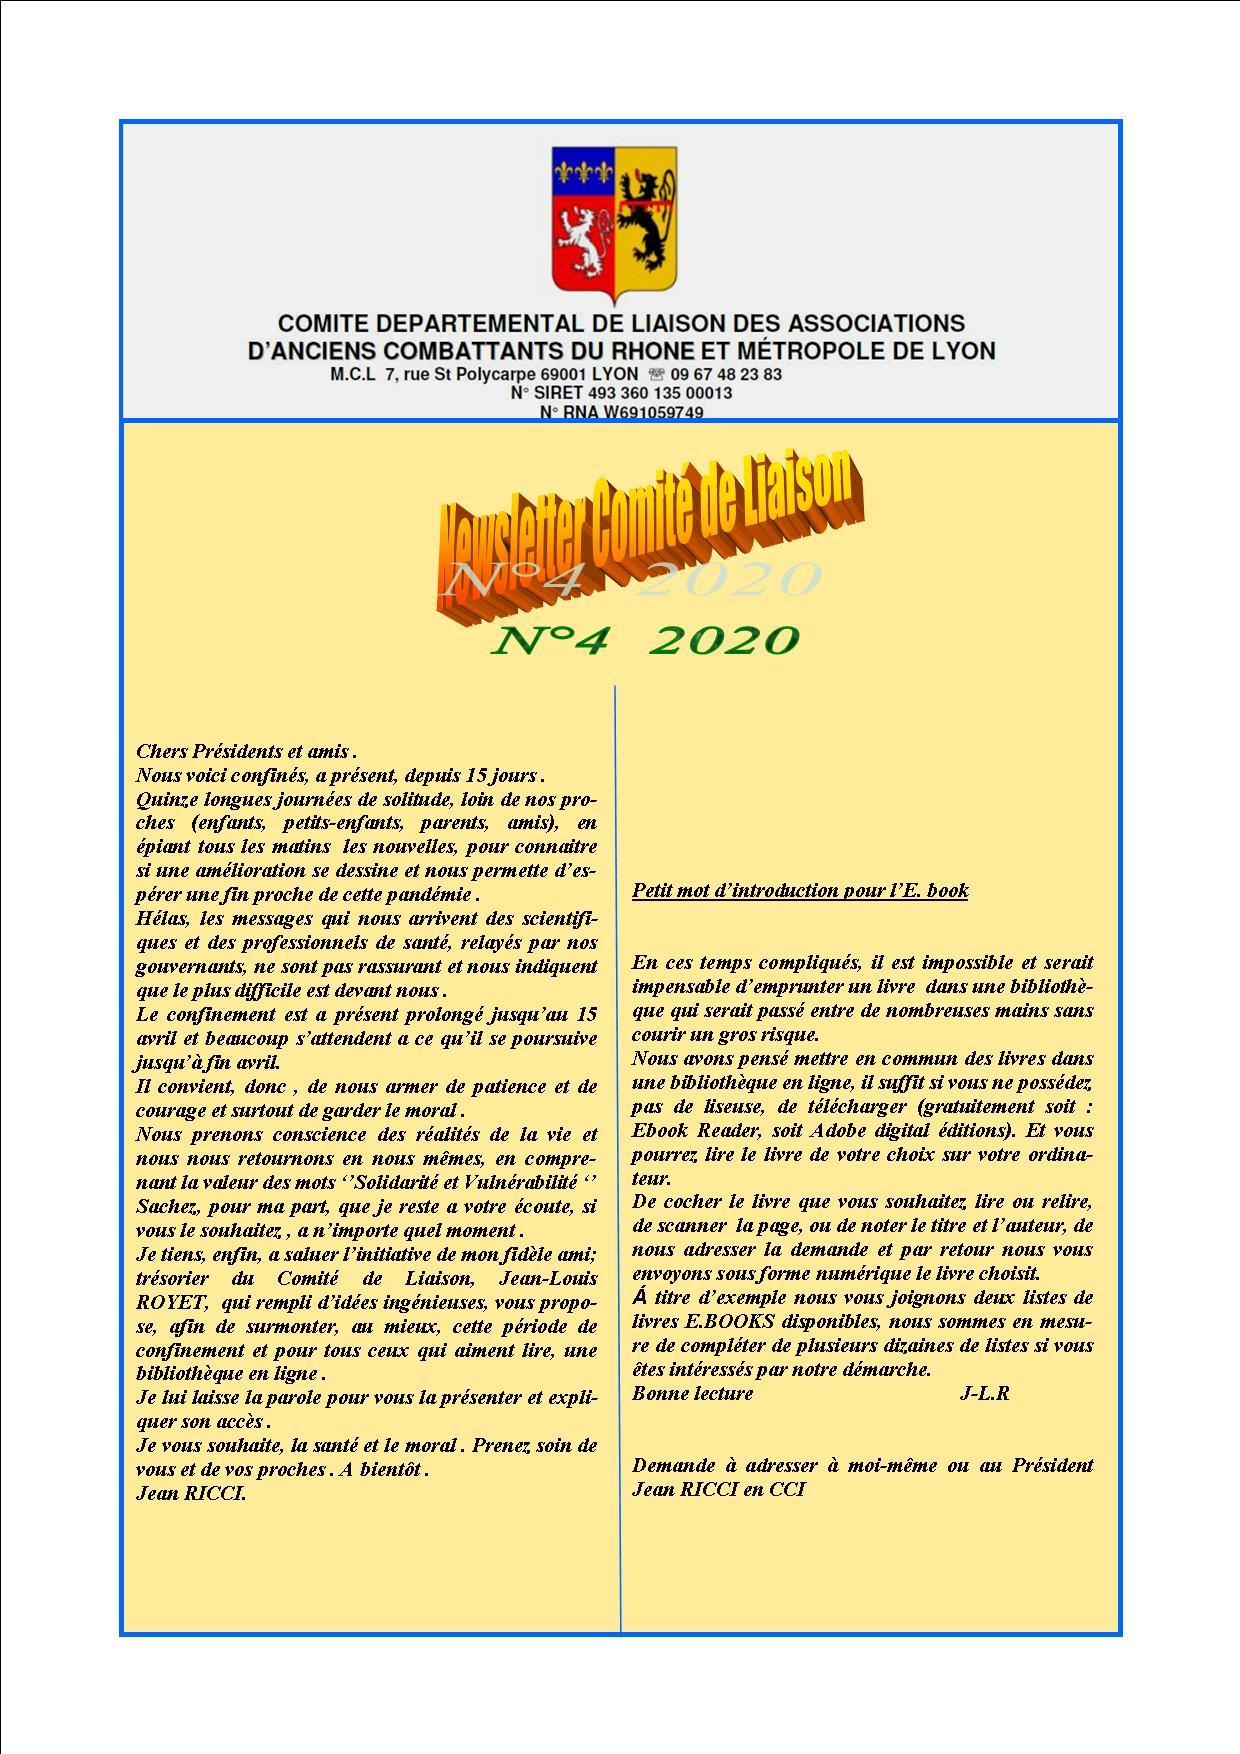 Newsletter comite de liaisonn 4 2020